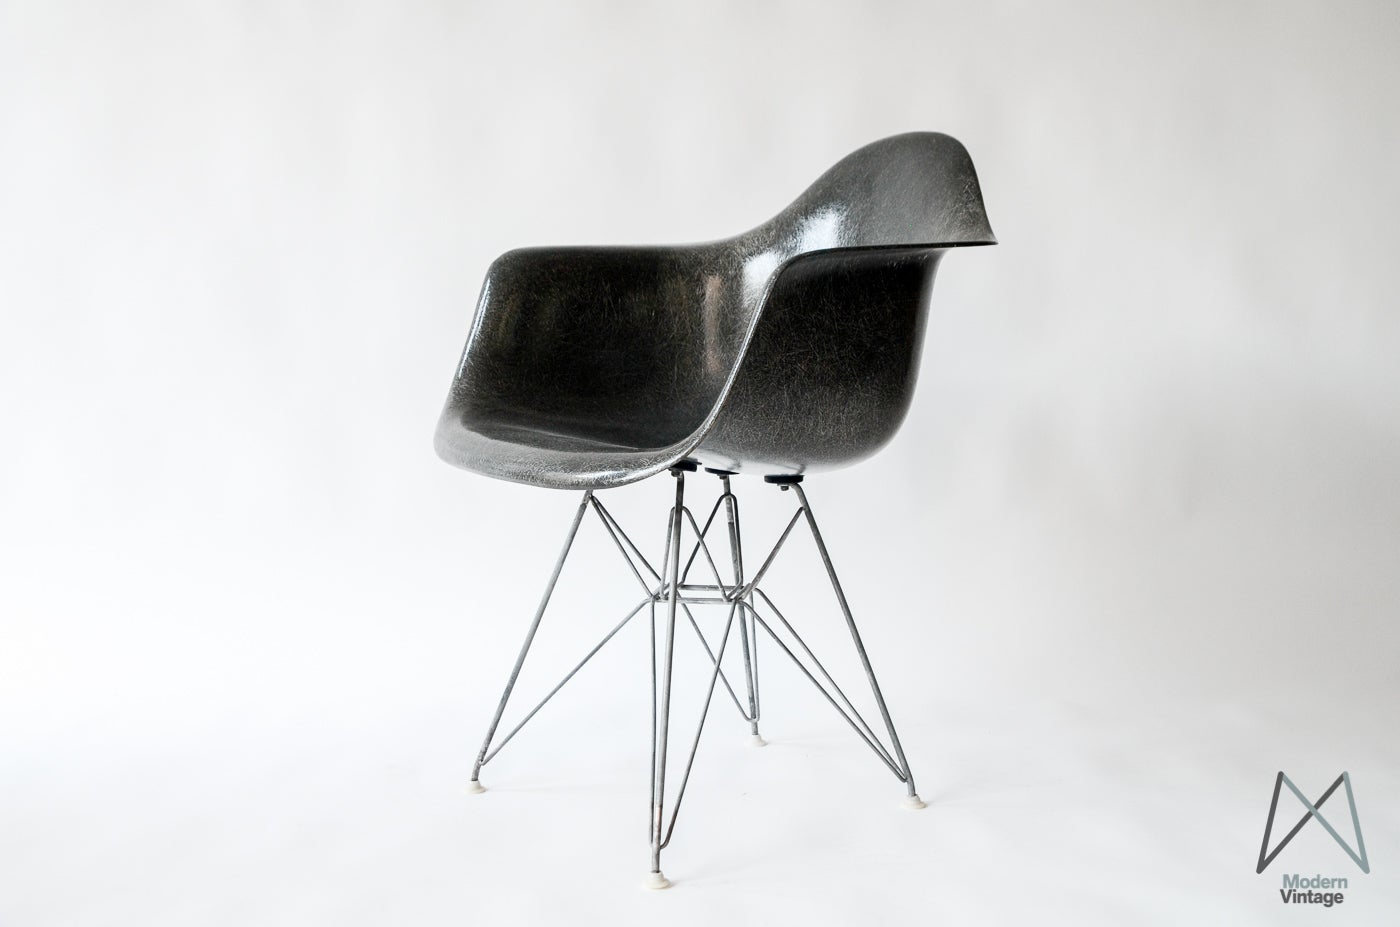 Sessel modern  Modern Vintage Amsterdam - Original Eames Furniture — Eames DAR ...